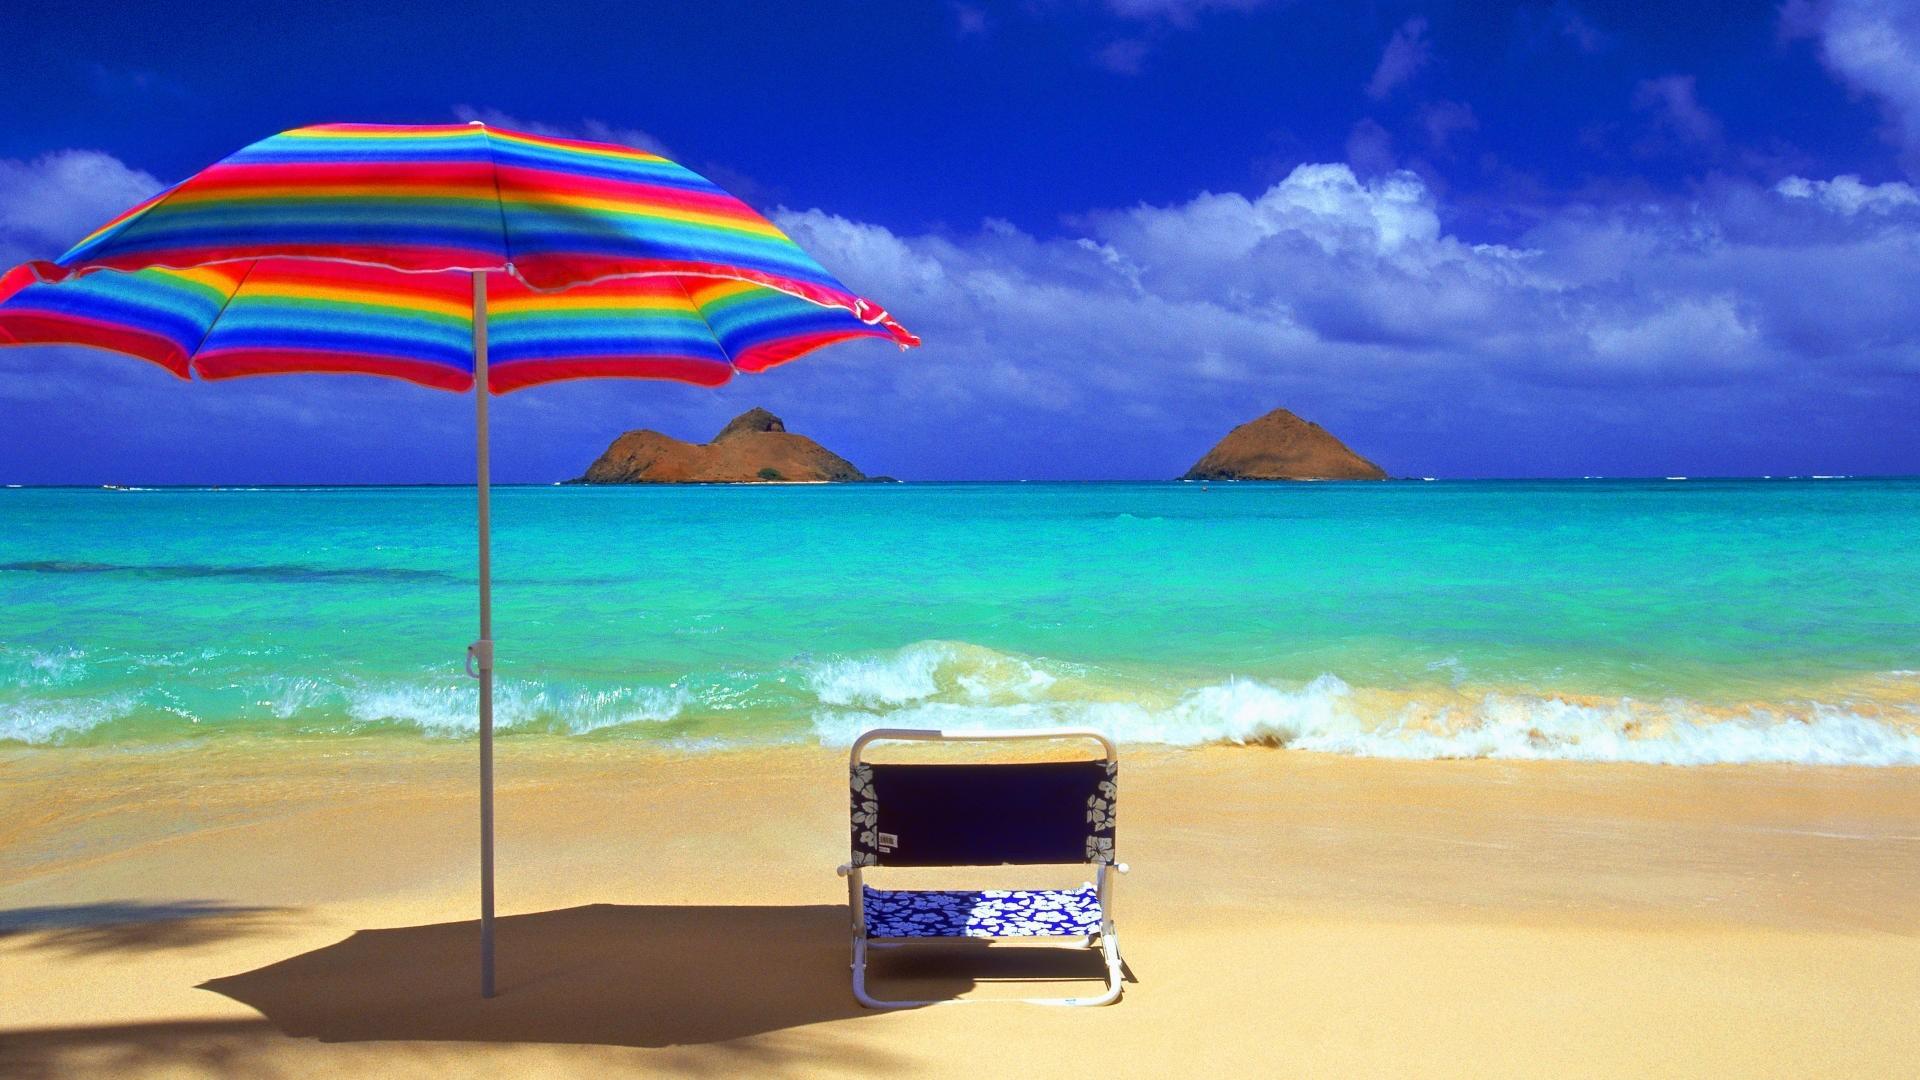 Wallpaper and poster of sun beach umbrella hd wallpaper in Beach . From  Background Wallpapers for